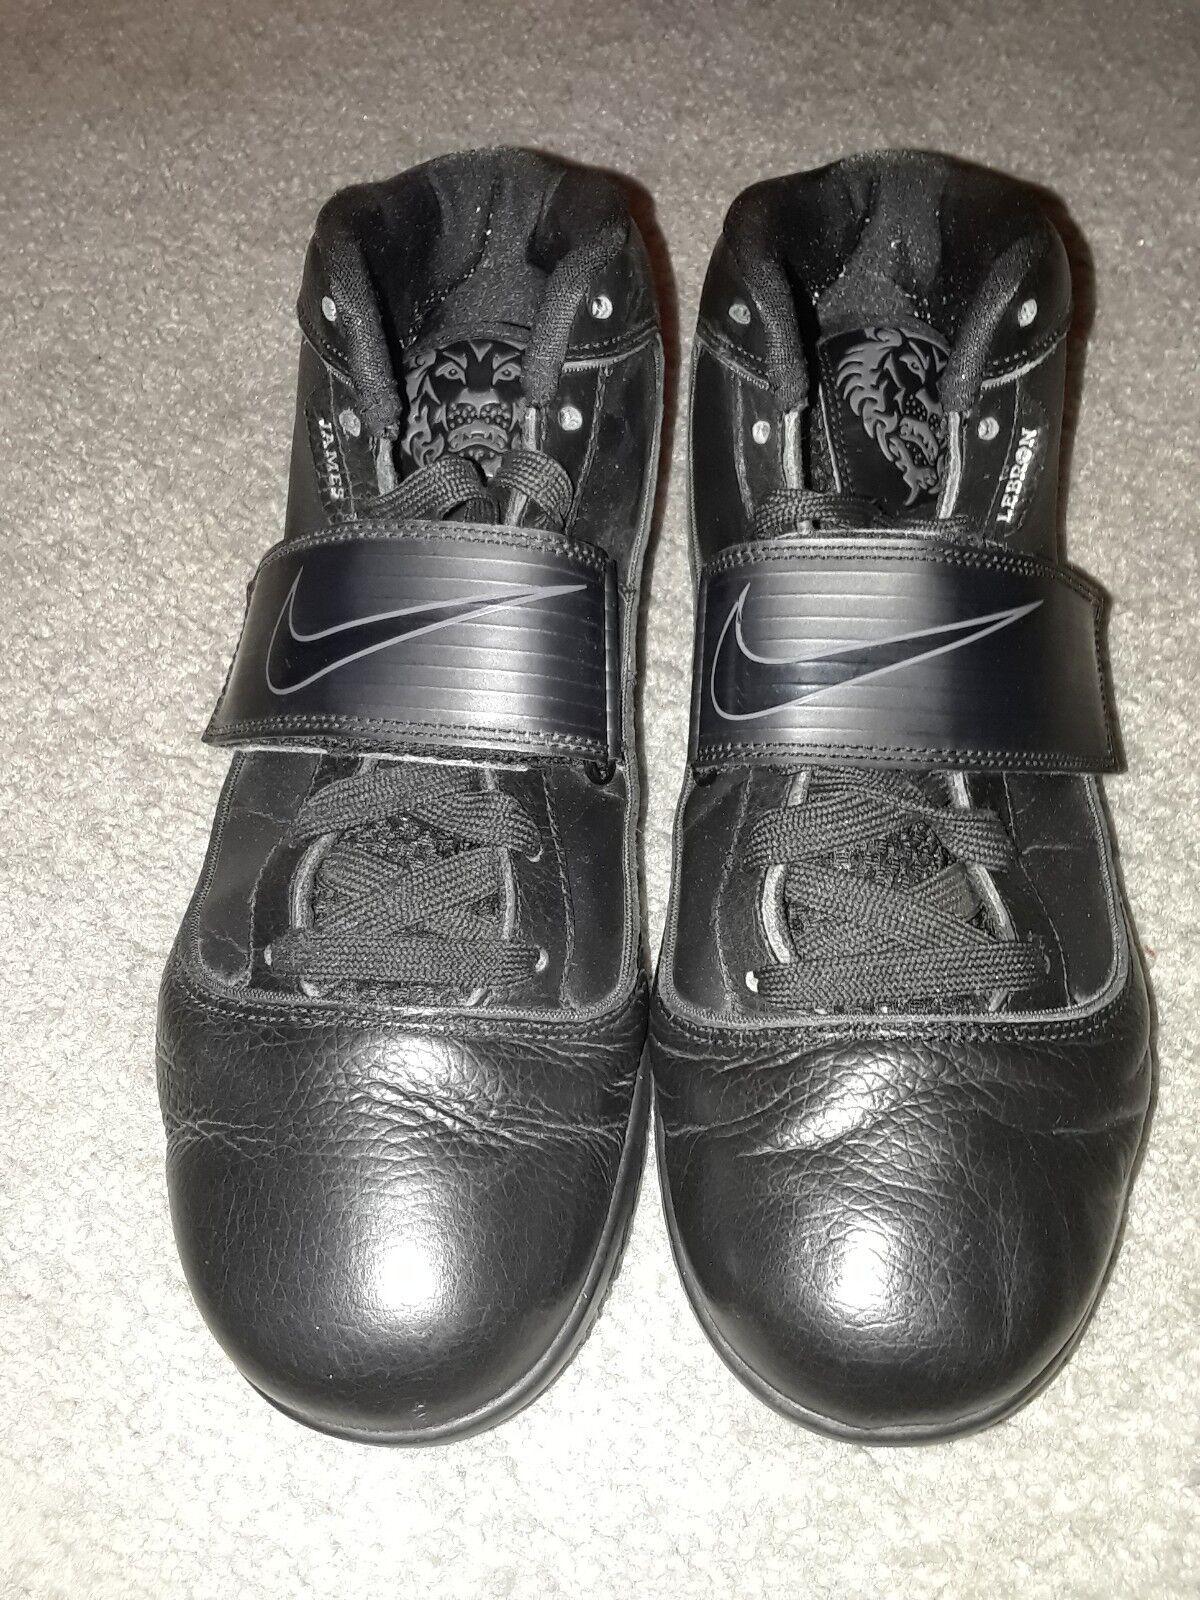 Nike lunar vigore 1 duckboot 17 17 duckboot scarpe styleair vigore 1 10 sz c9cbcf